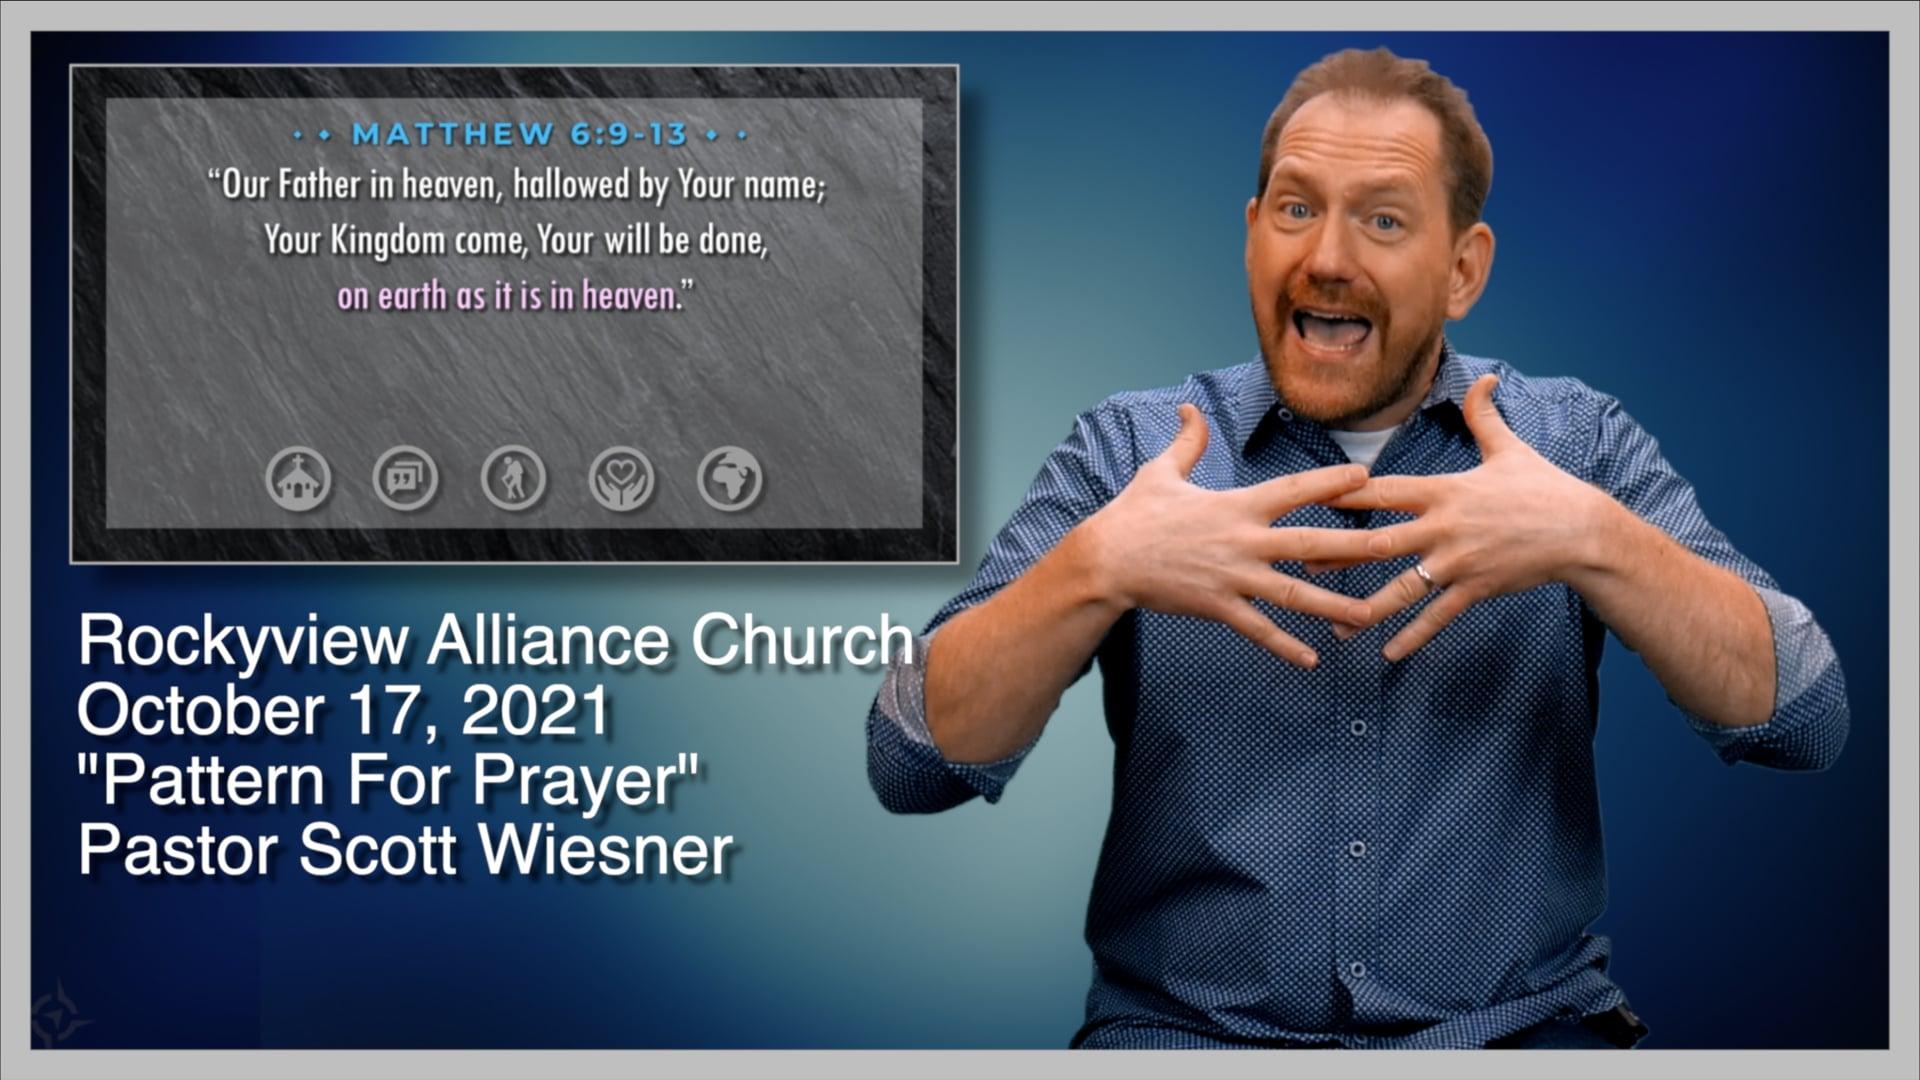 October 17, 2021 - Scott Wiesner - Pattern For Prayer